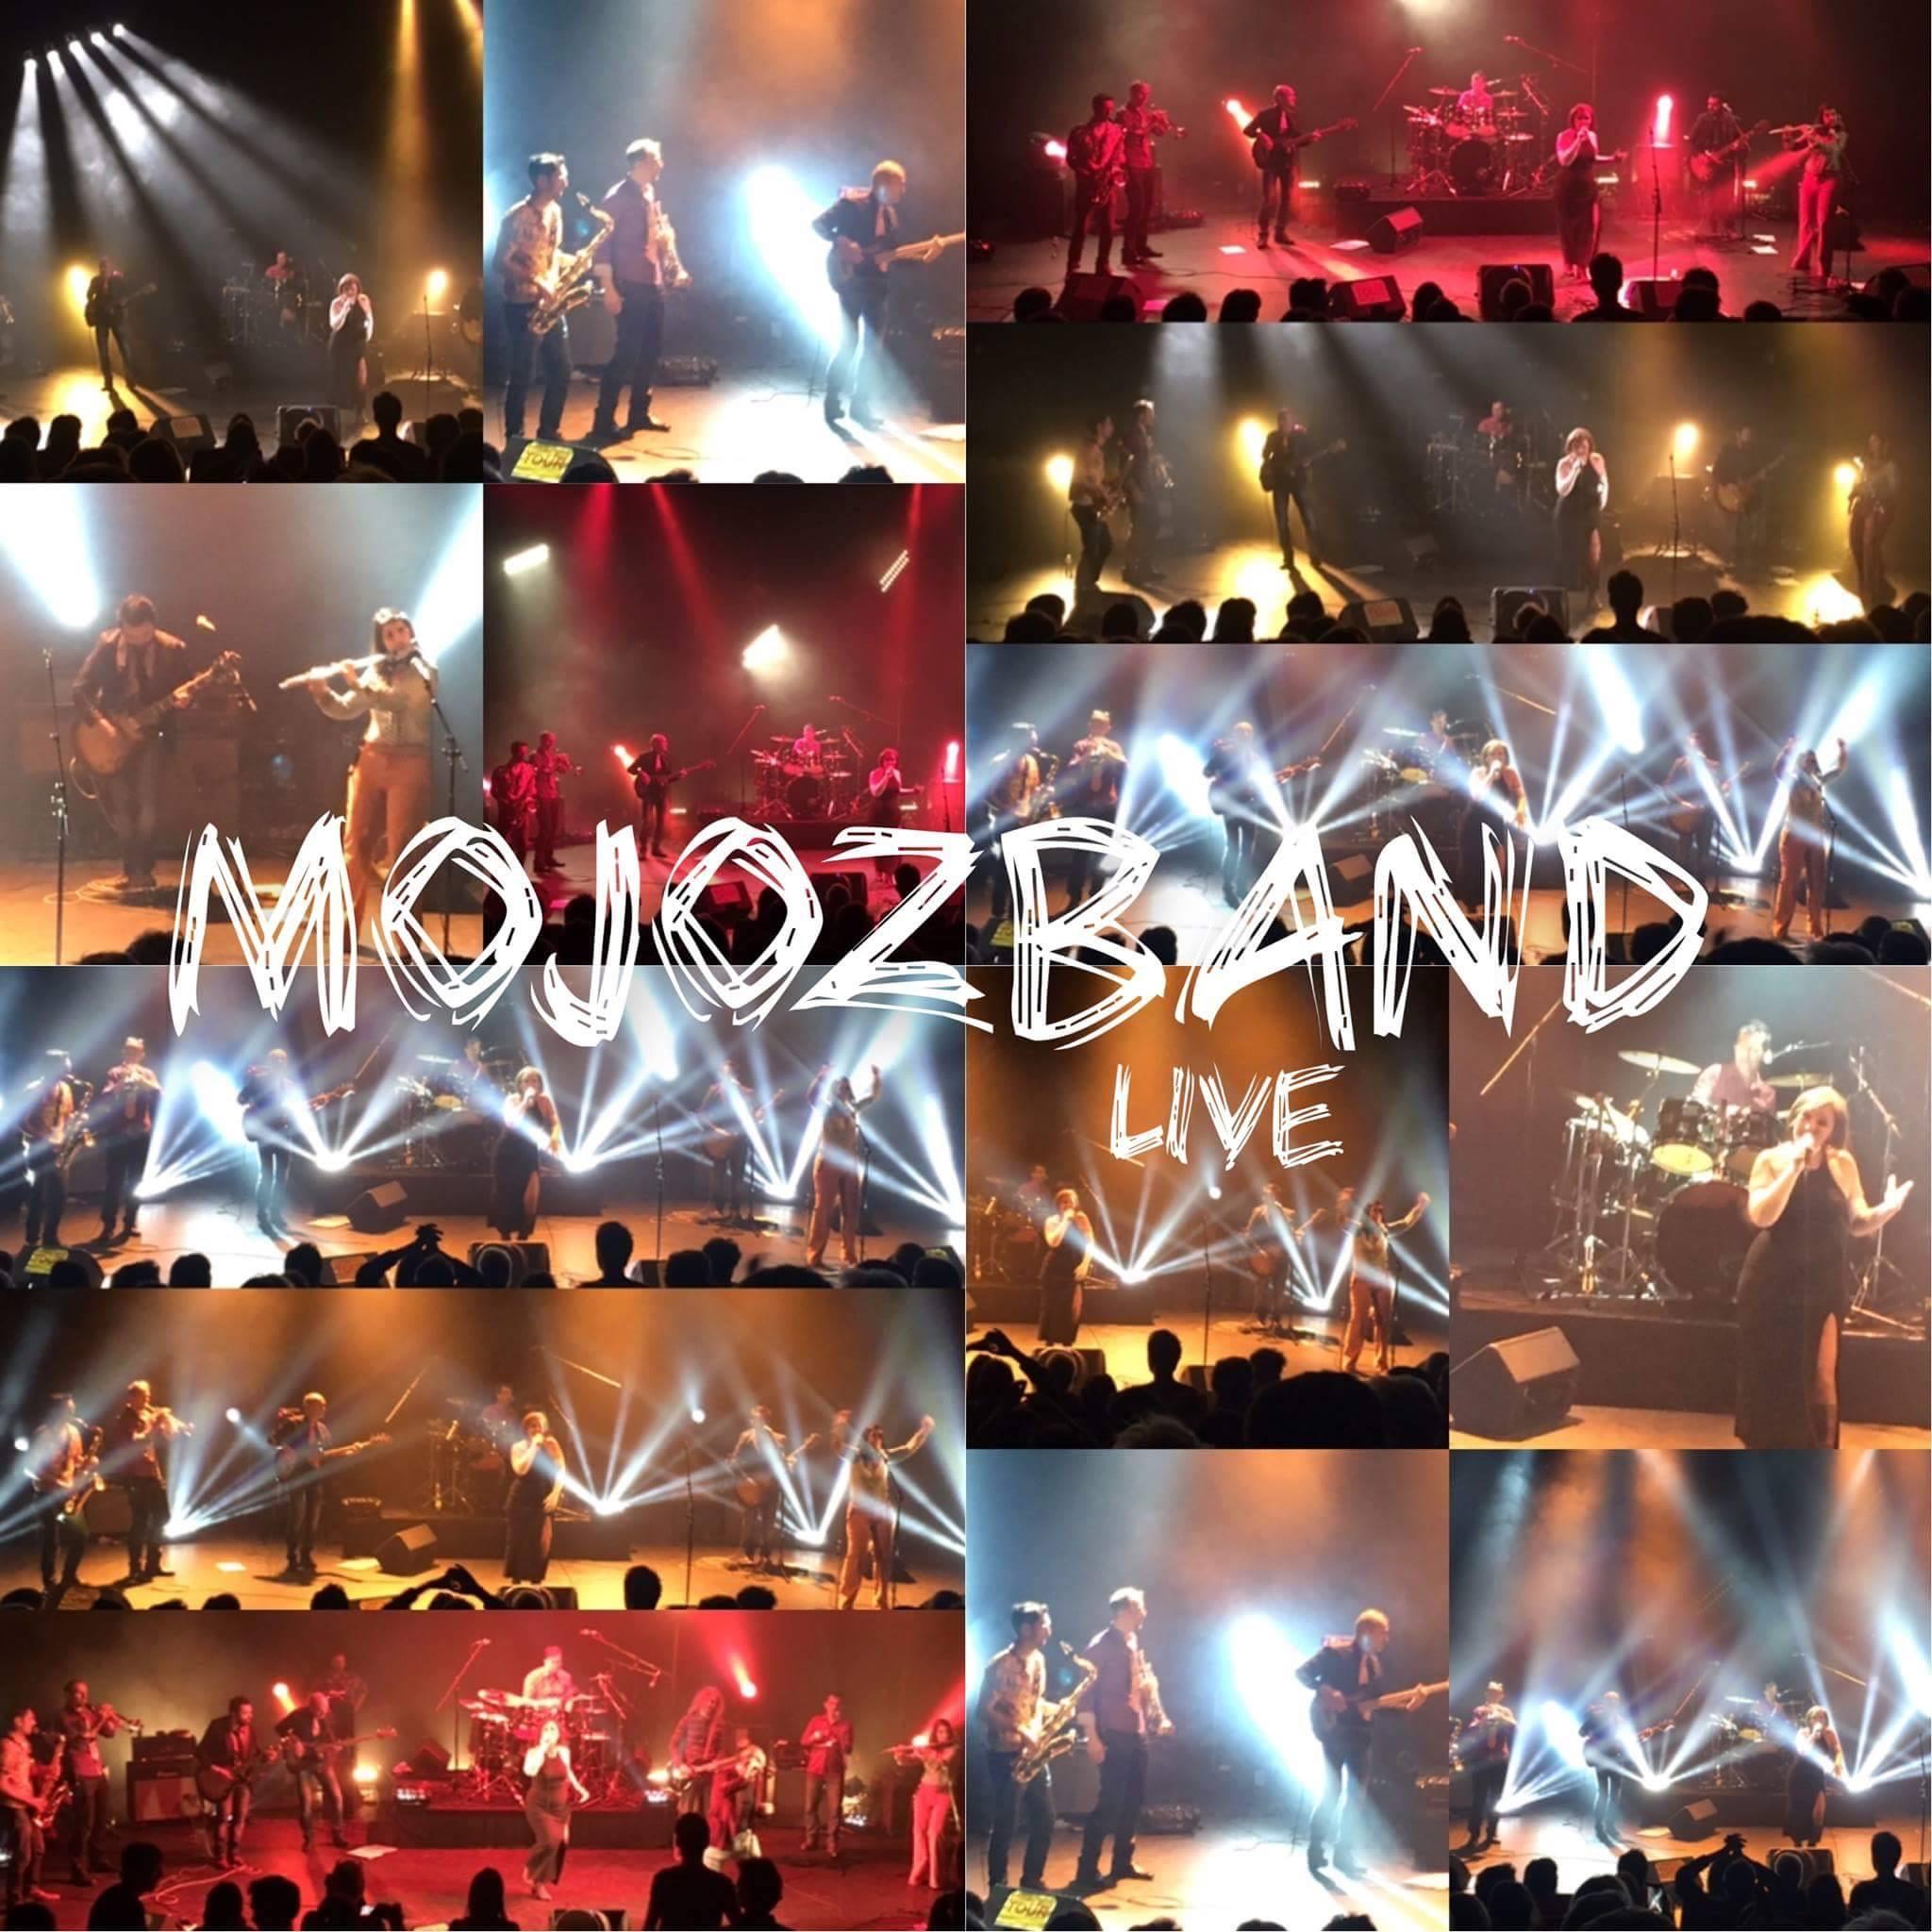 Les MojozBand en concert au café Brocante Grenoble